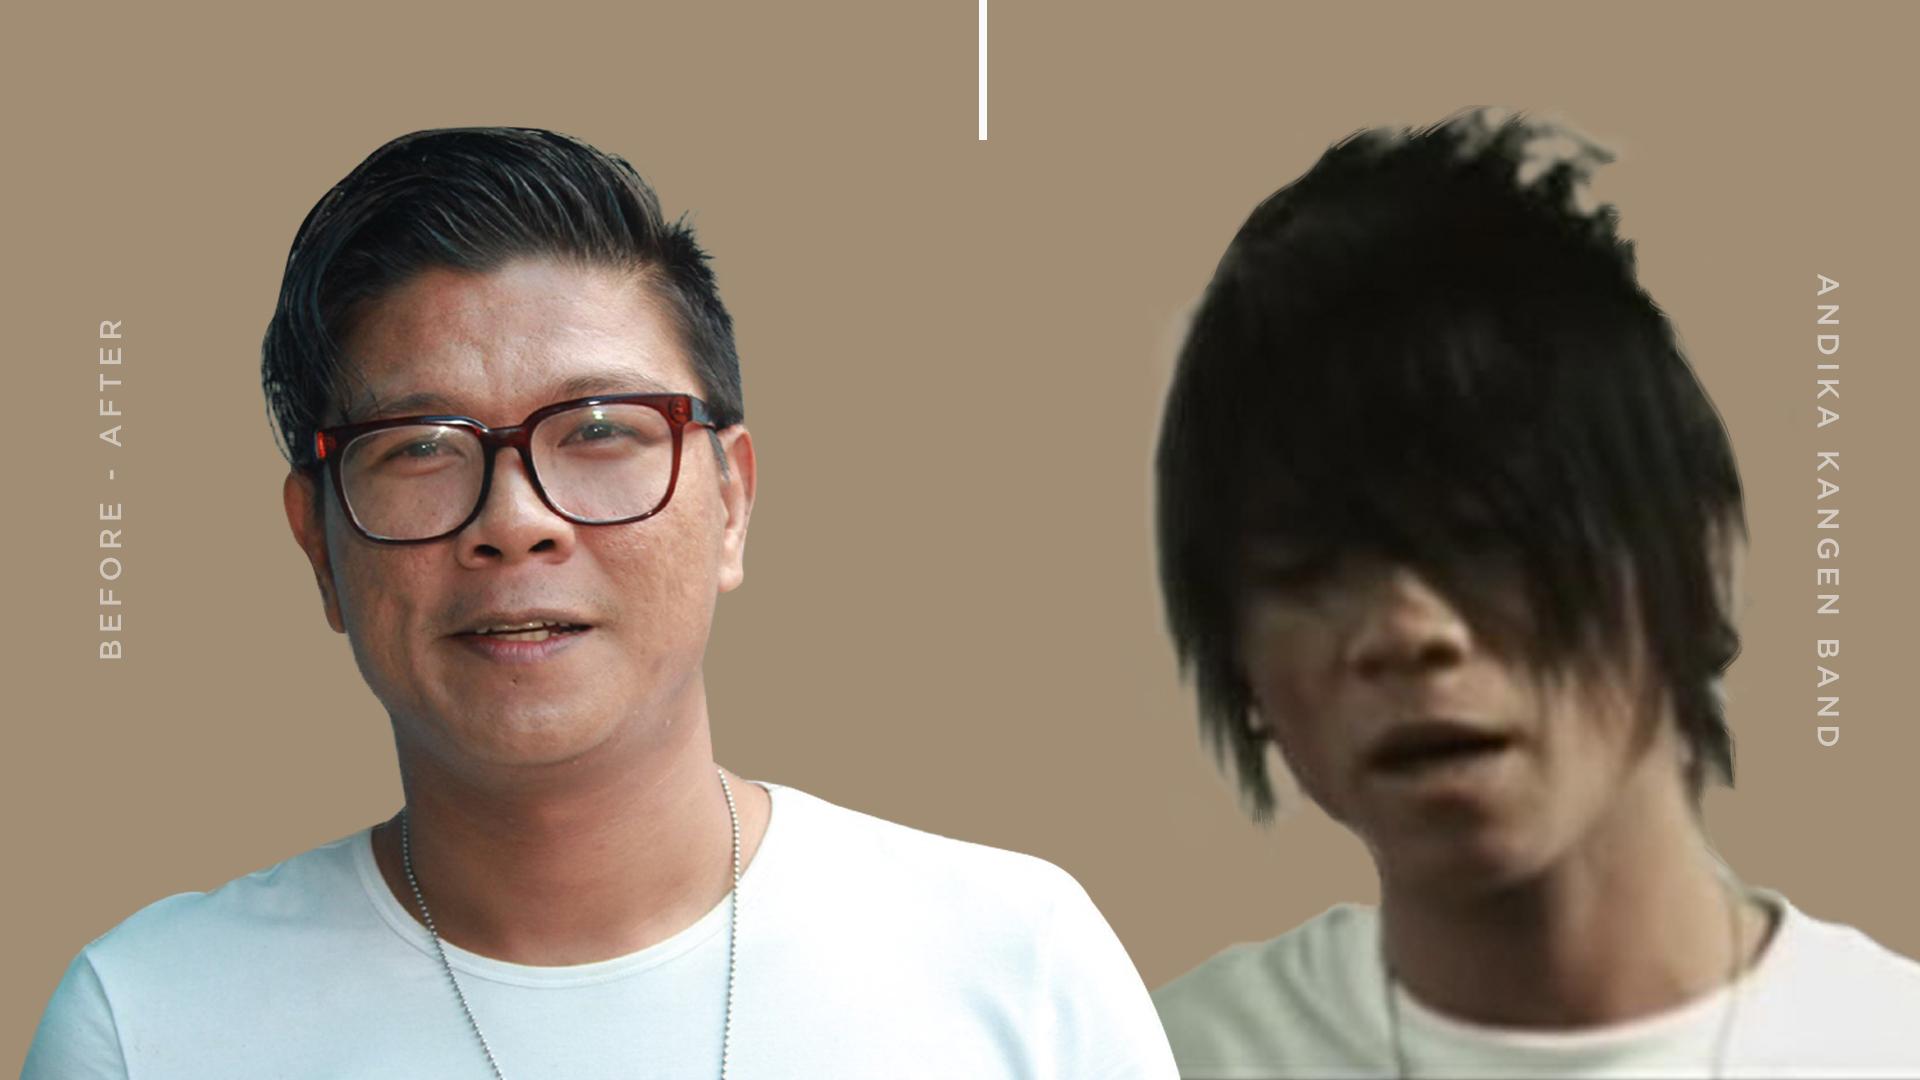 Gaya Rambut Polwan Yang Bikin Gemes Netizen